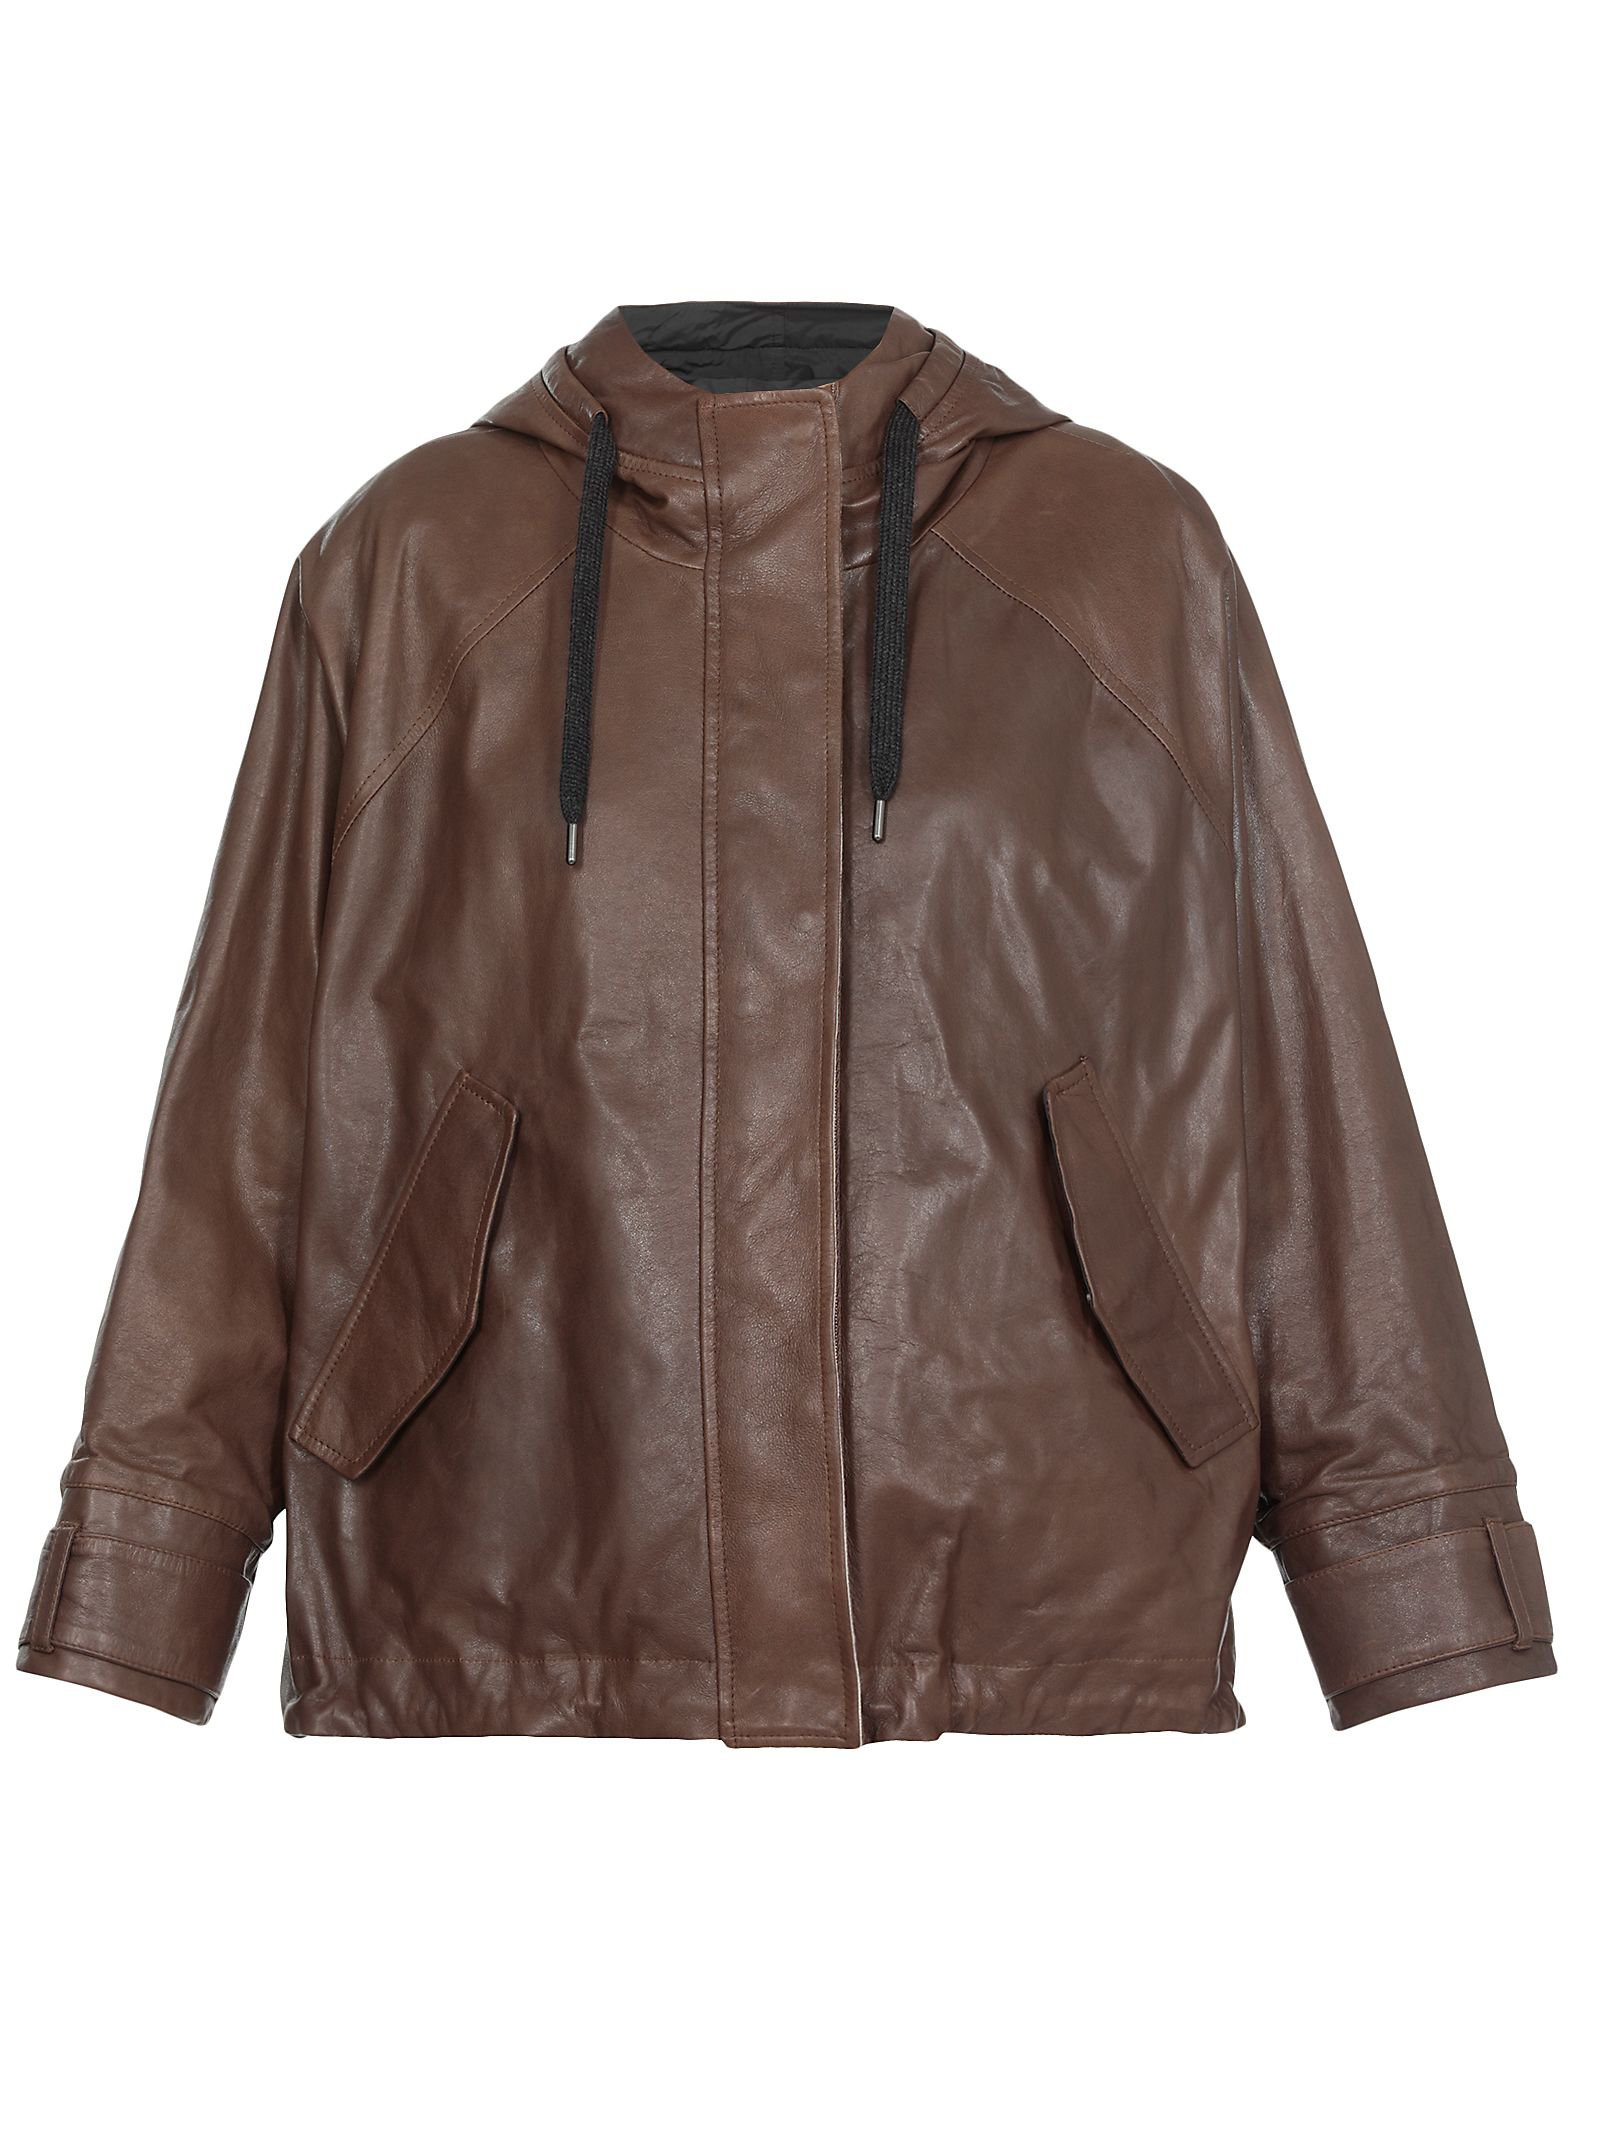 Brunello Cucinelli Reversible Jacket